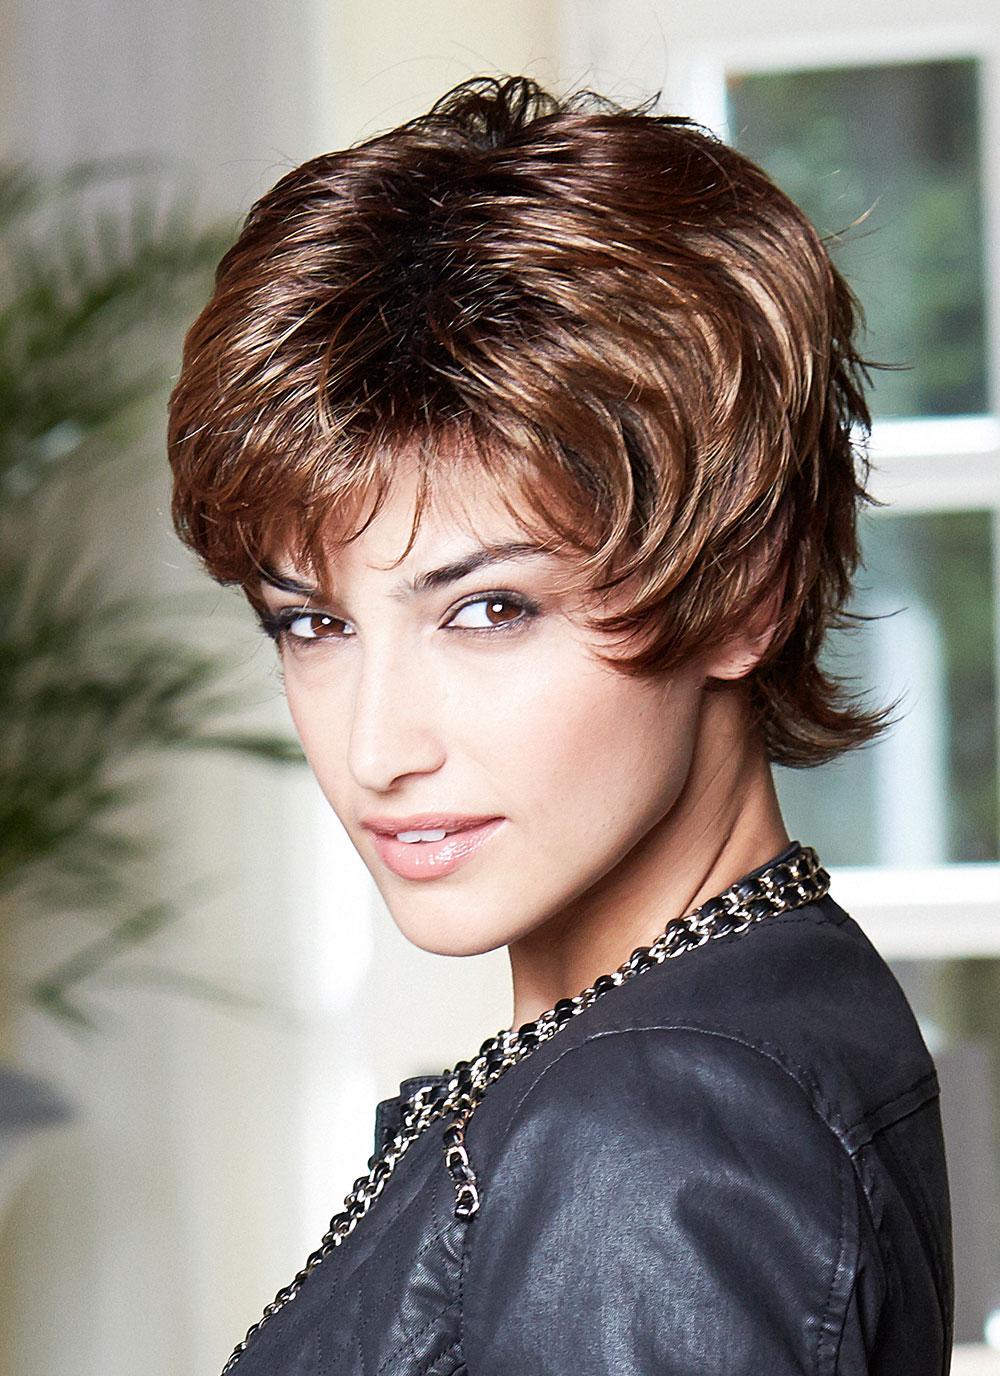 Gisela Mayer Perücke: Visconti Fashion Lace